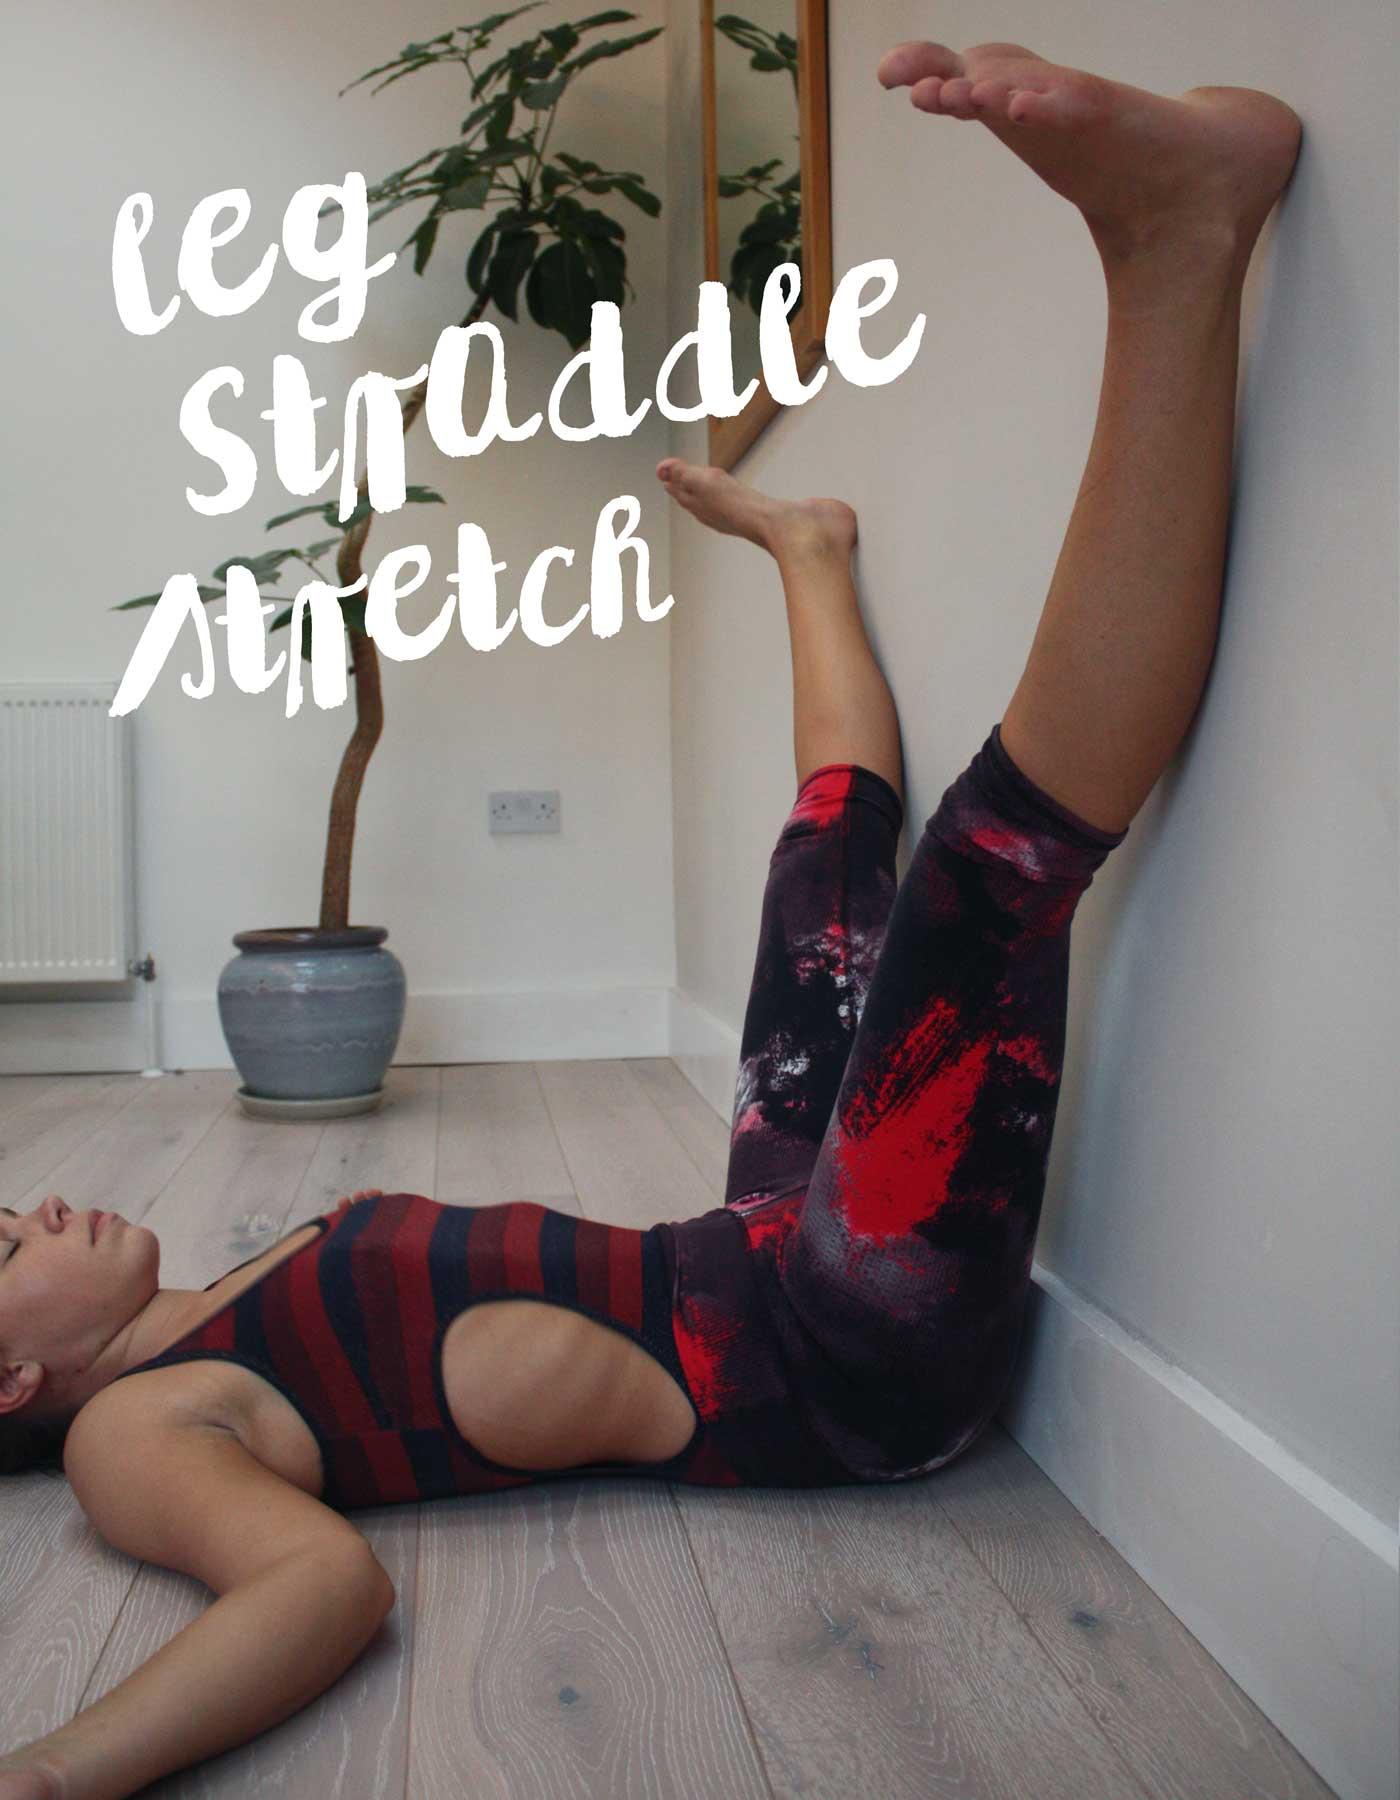 wall-yoga-straddle